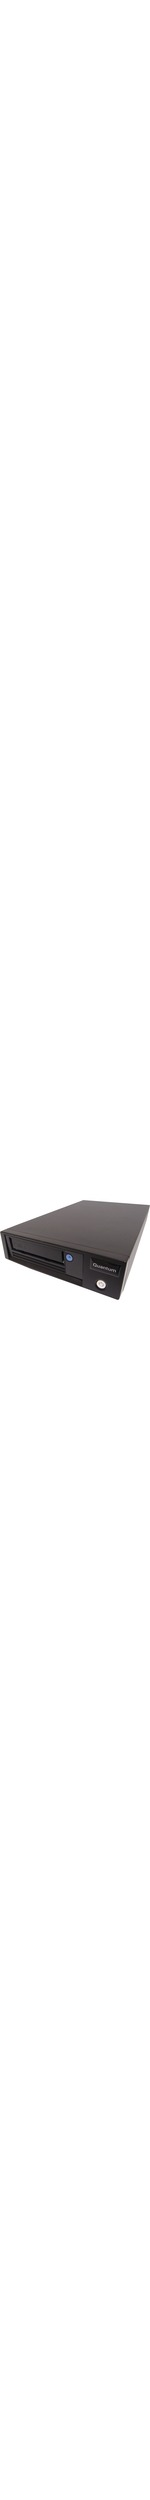 Quantum LTO-5 Tape Drive - 1.50 TB Native/3 TB Compressed - 1/2H Height